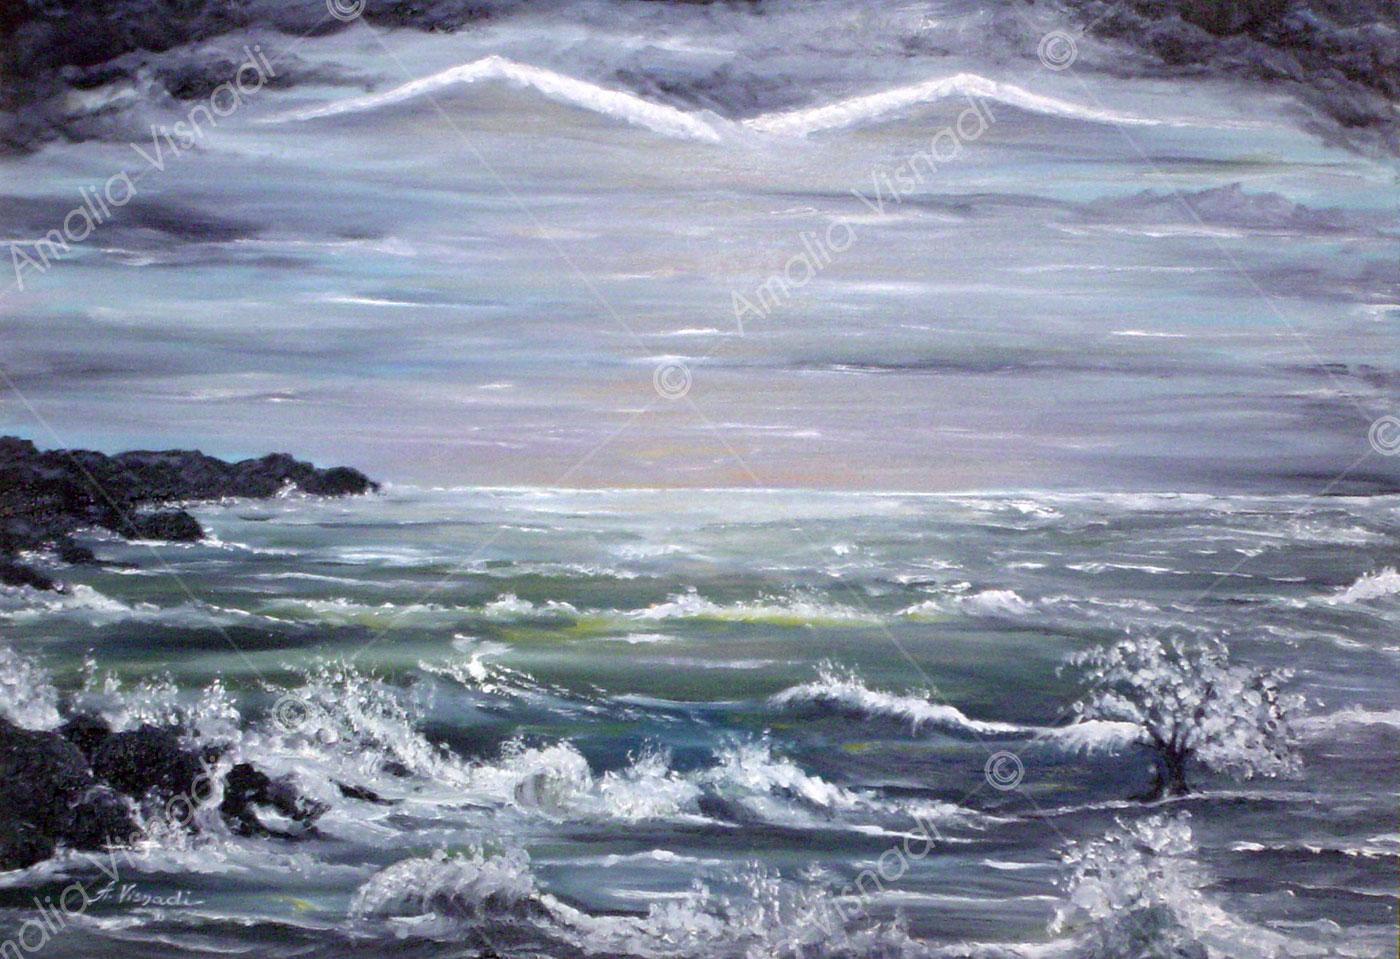 Siddharta nell'oceano_Olio su tela 40 x 50